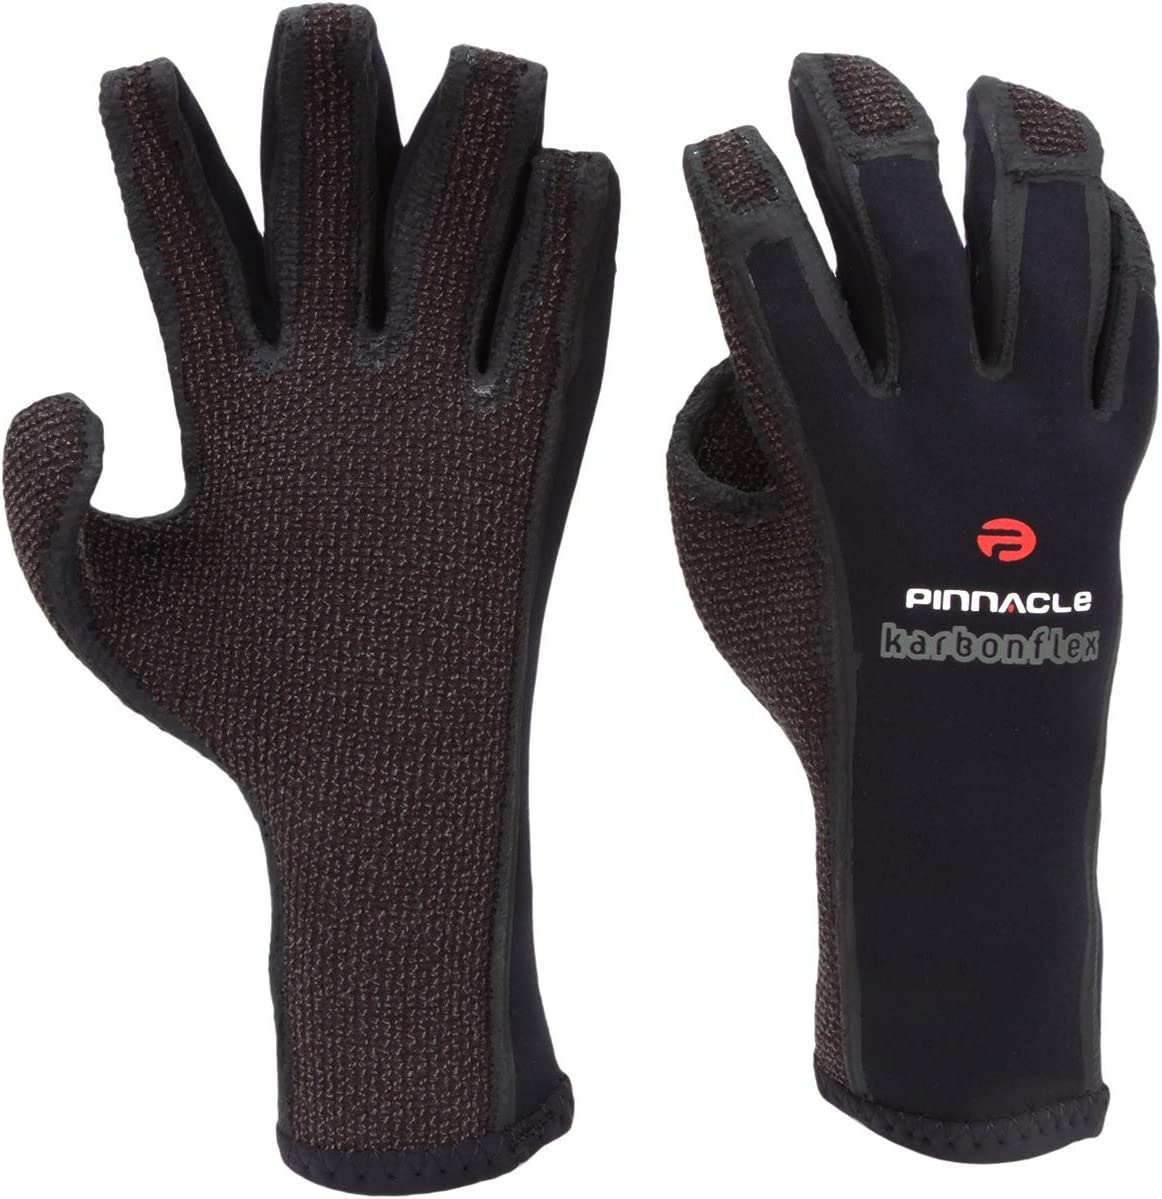 Pinnacle 2mm Titanium 海外輸入 Kevlar Karbonflex Diving 爆売りセール開催中 Gloves XT